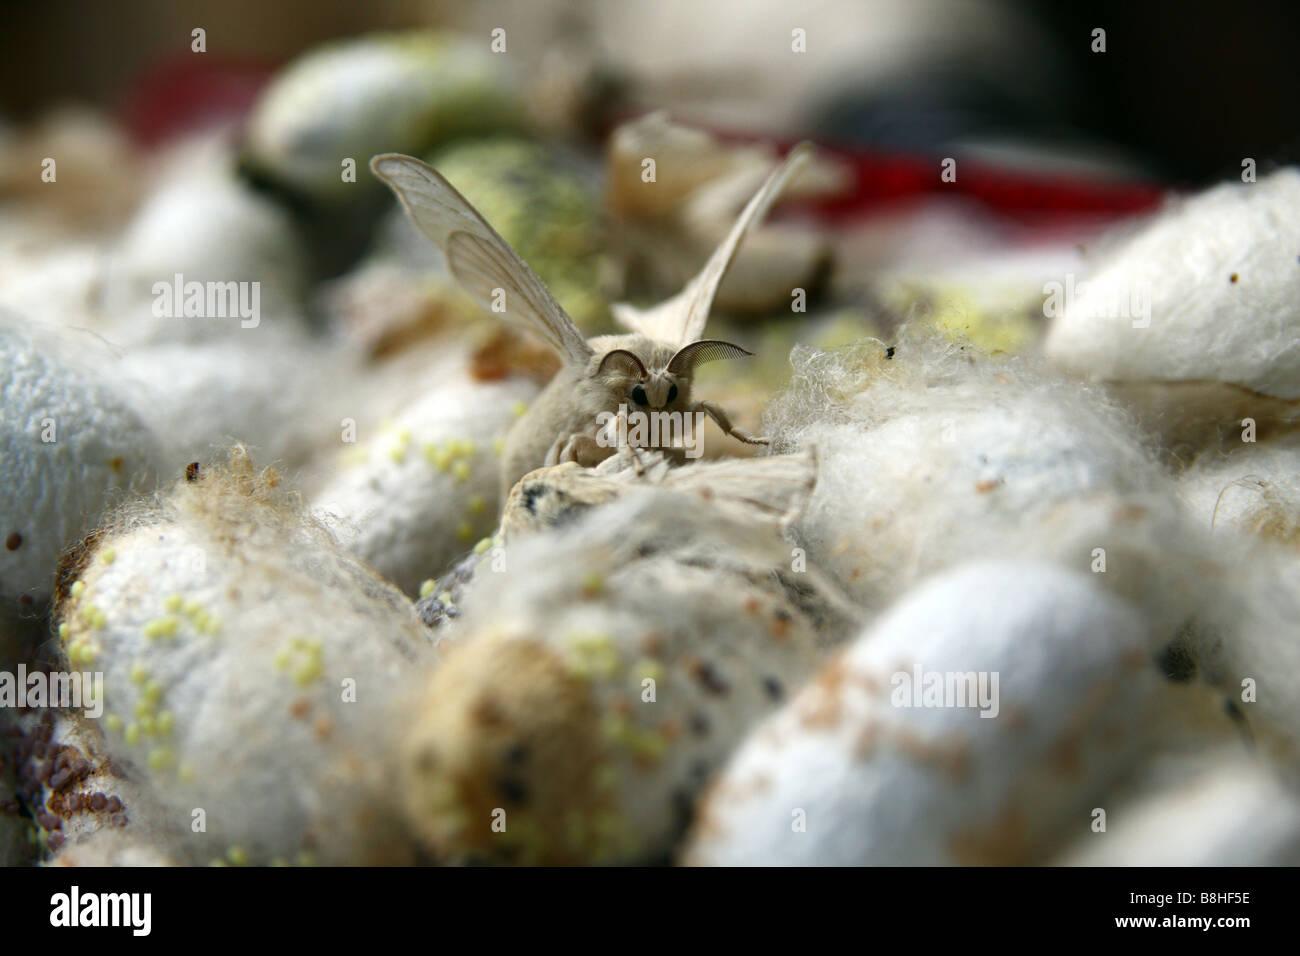 Close-up. Silk cocoons pupas of silkworm moth Bombyx mori silkwood. Dalat, Vietnam - Stock Image